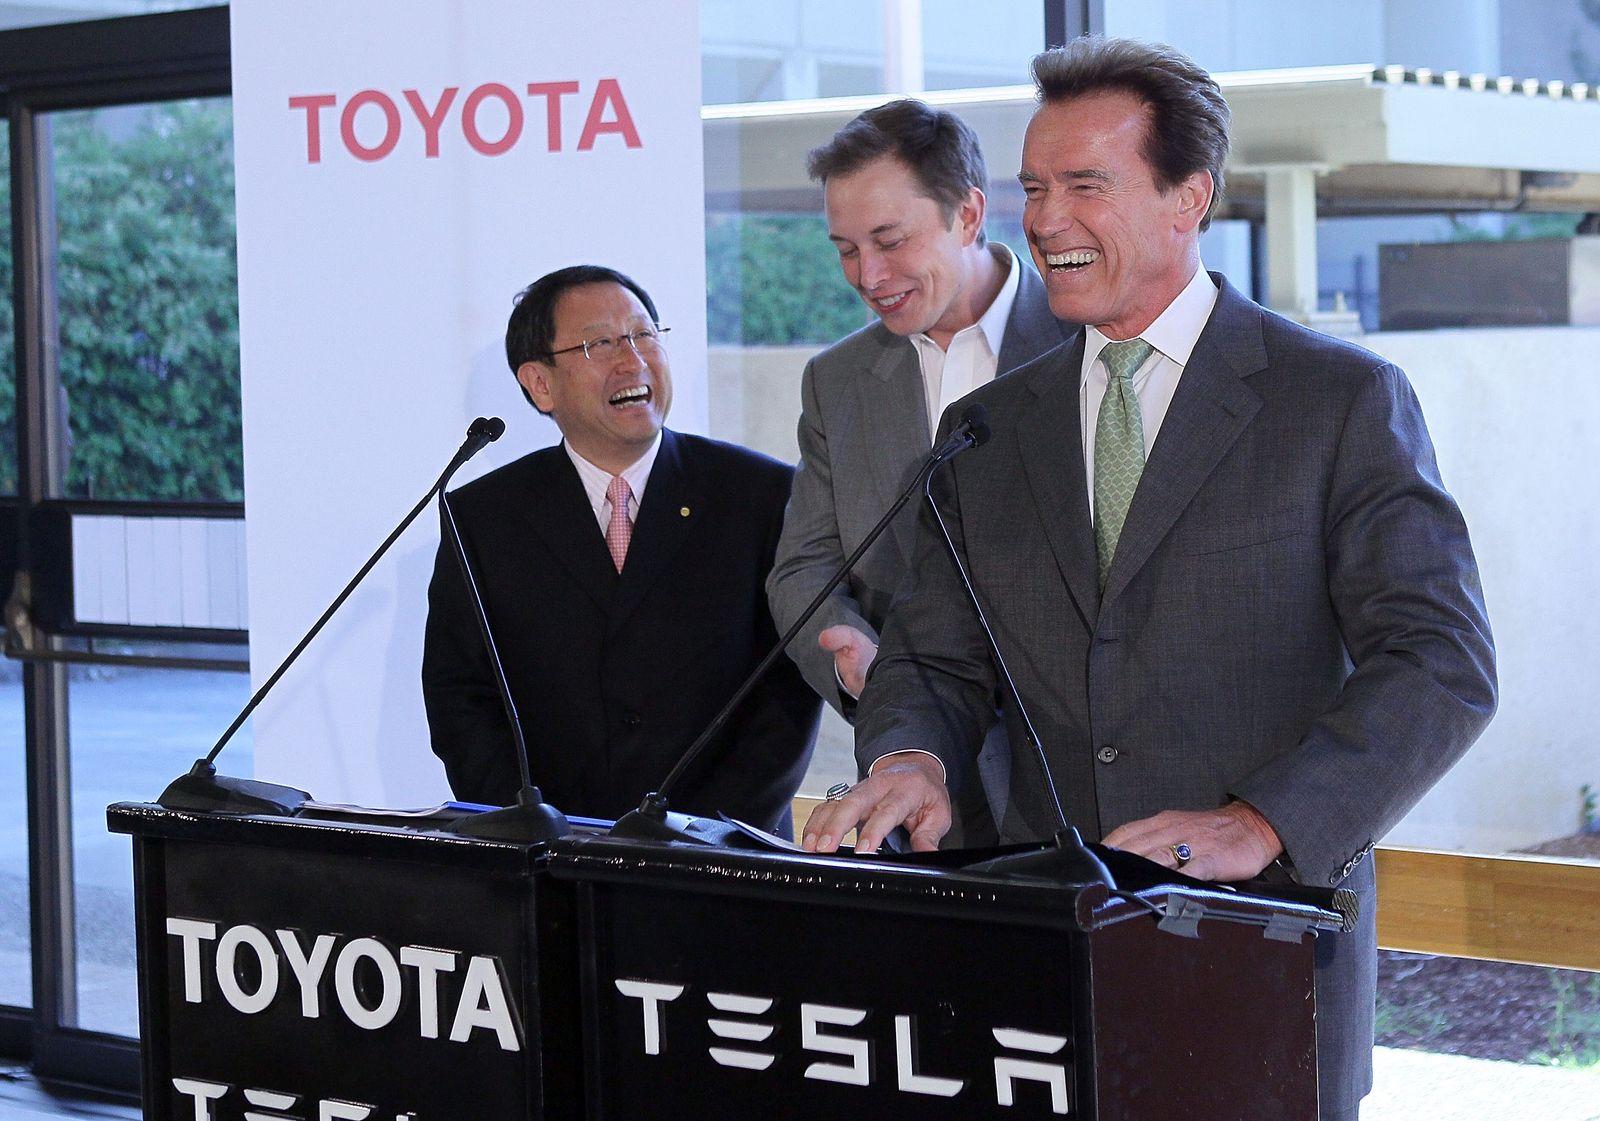 Schwarzenegger / Toyoda / Musk